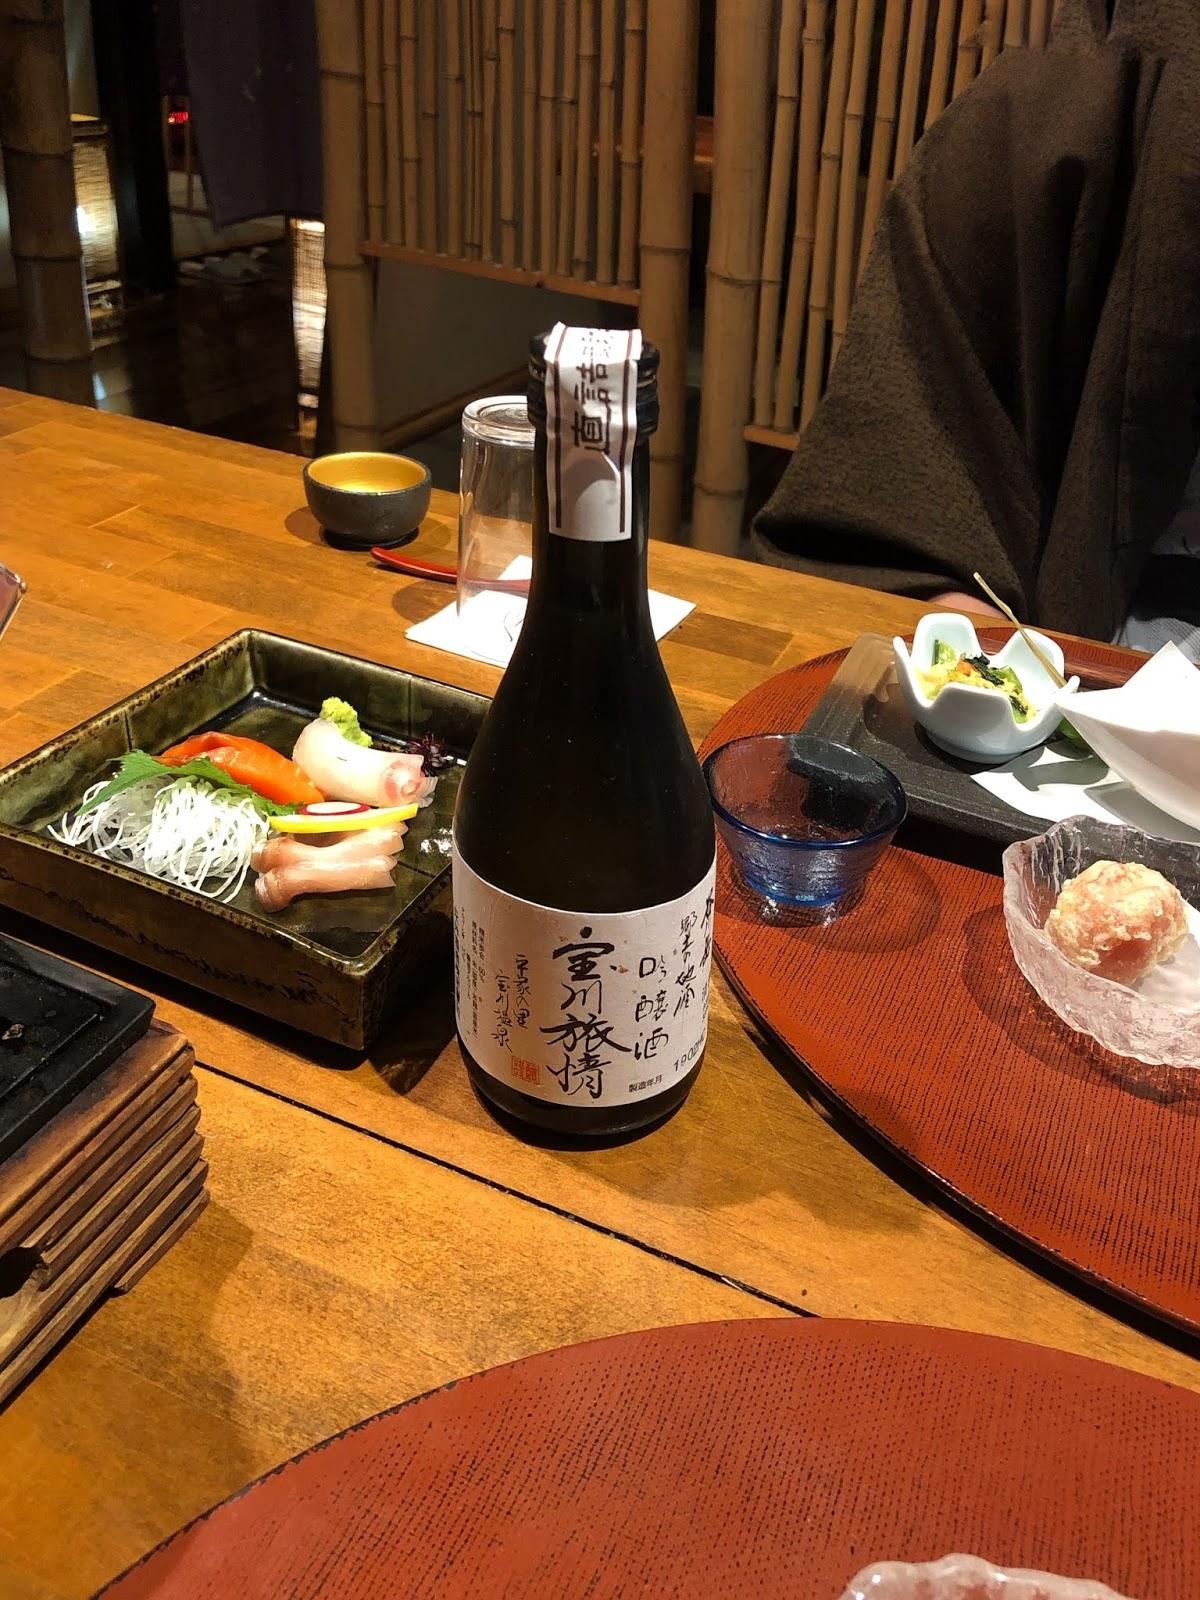 Kaiseki dinner, sake tasting, sashimi course, Biggest open-air bath onsen in Japan. Takaragawa Onsen, Minakami Gunma, Japan / FOREVERVANNY.com